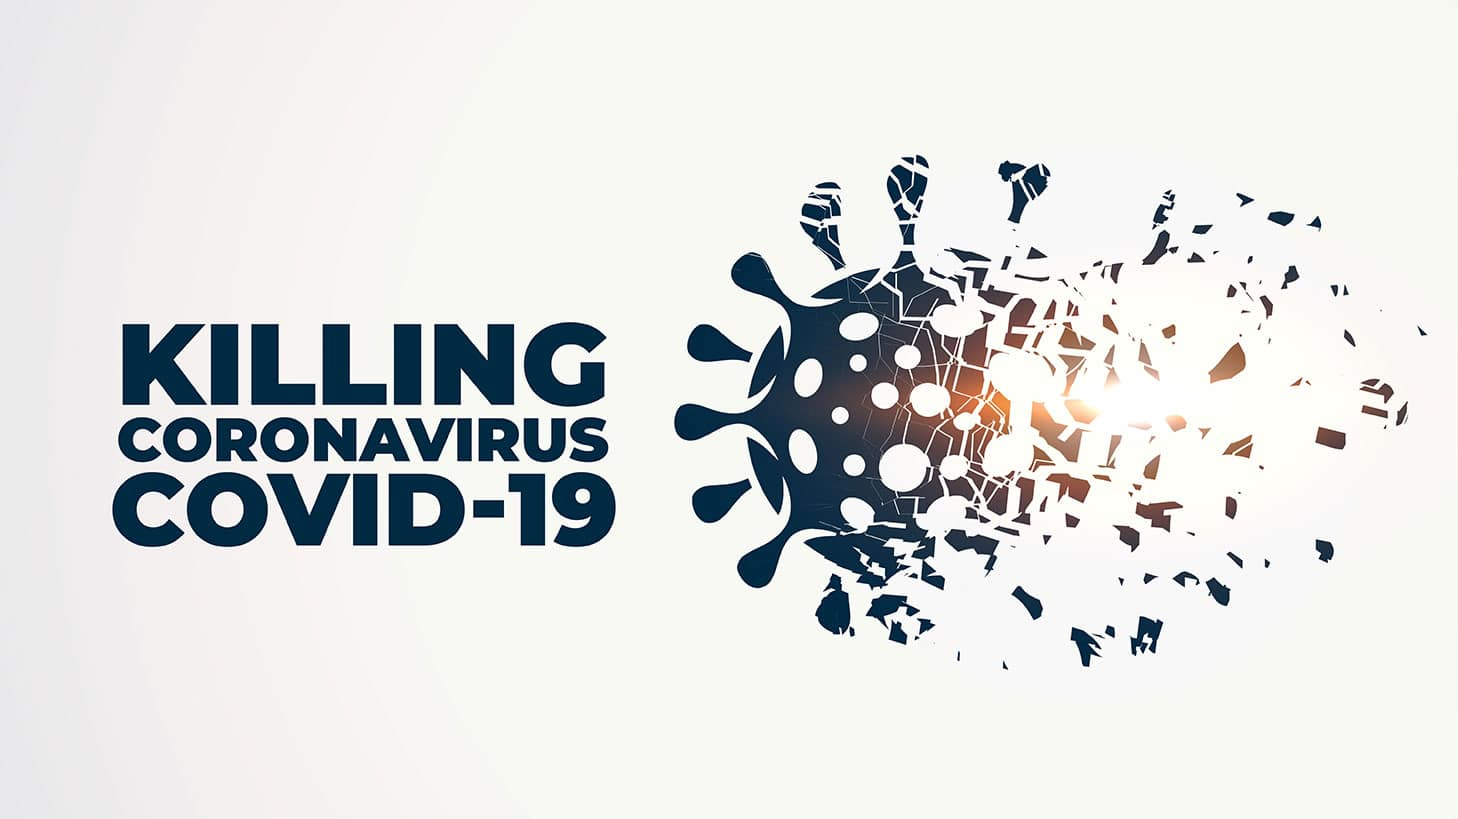 وکتور ویروس کرونا covid-19